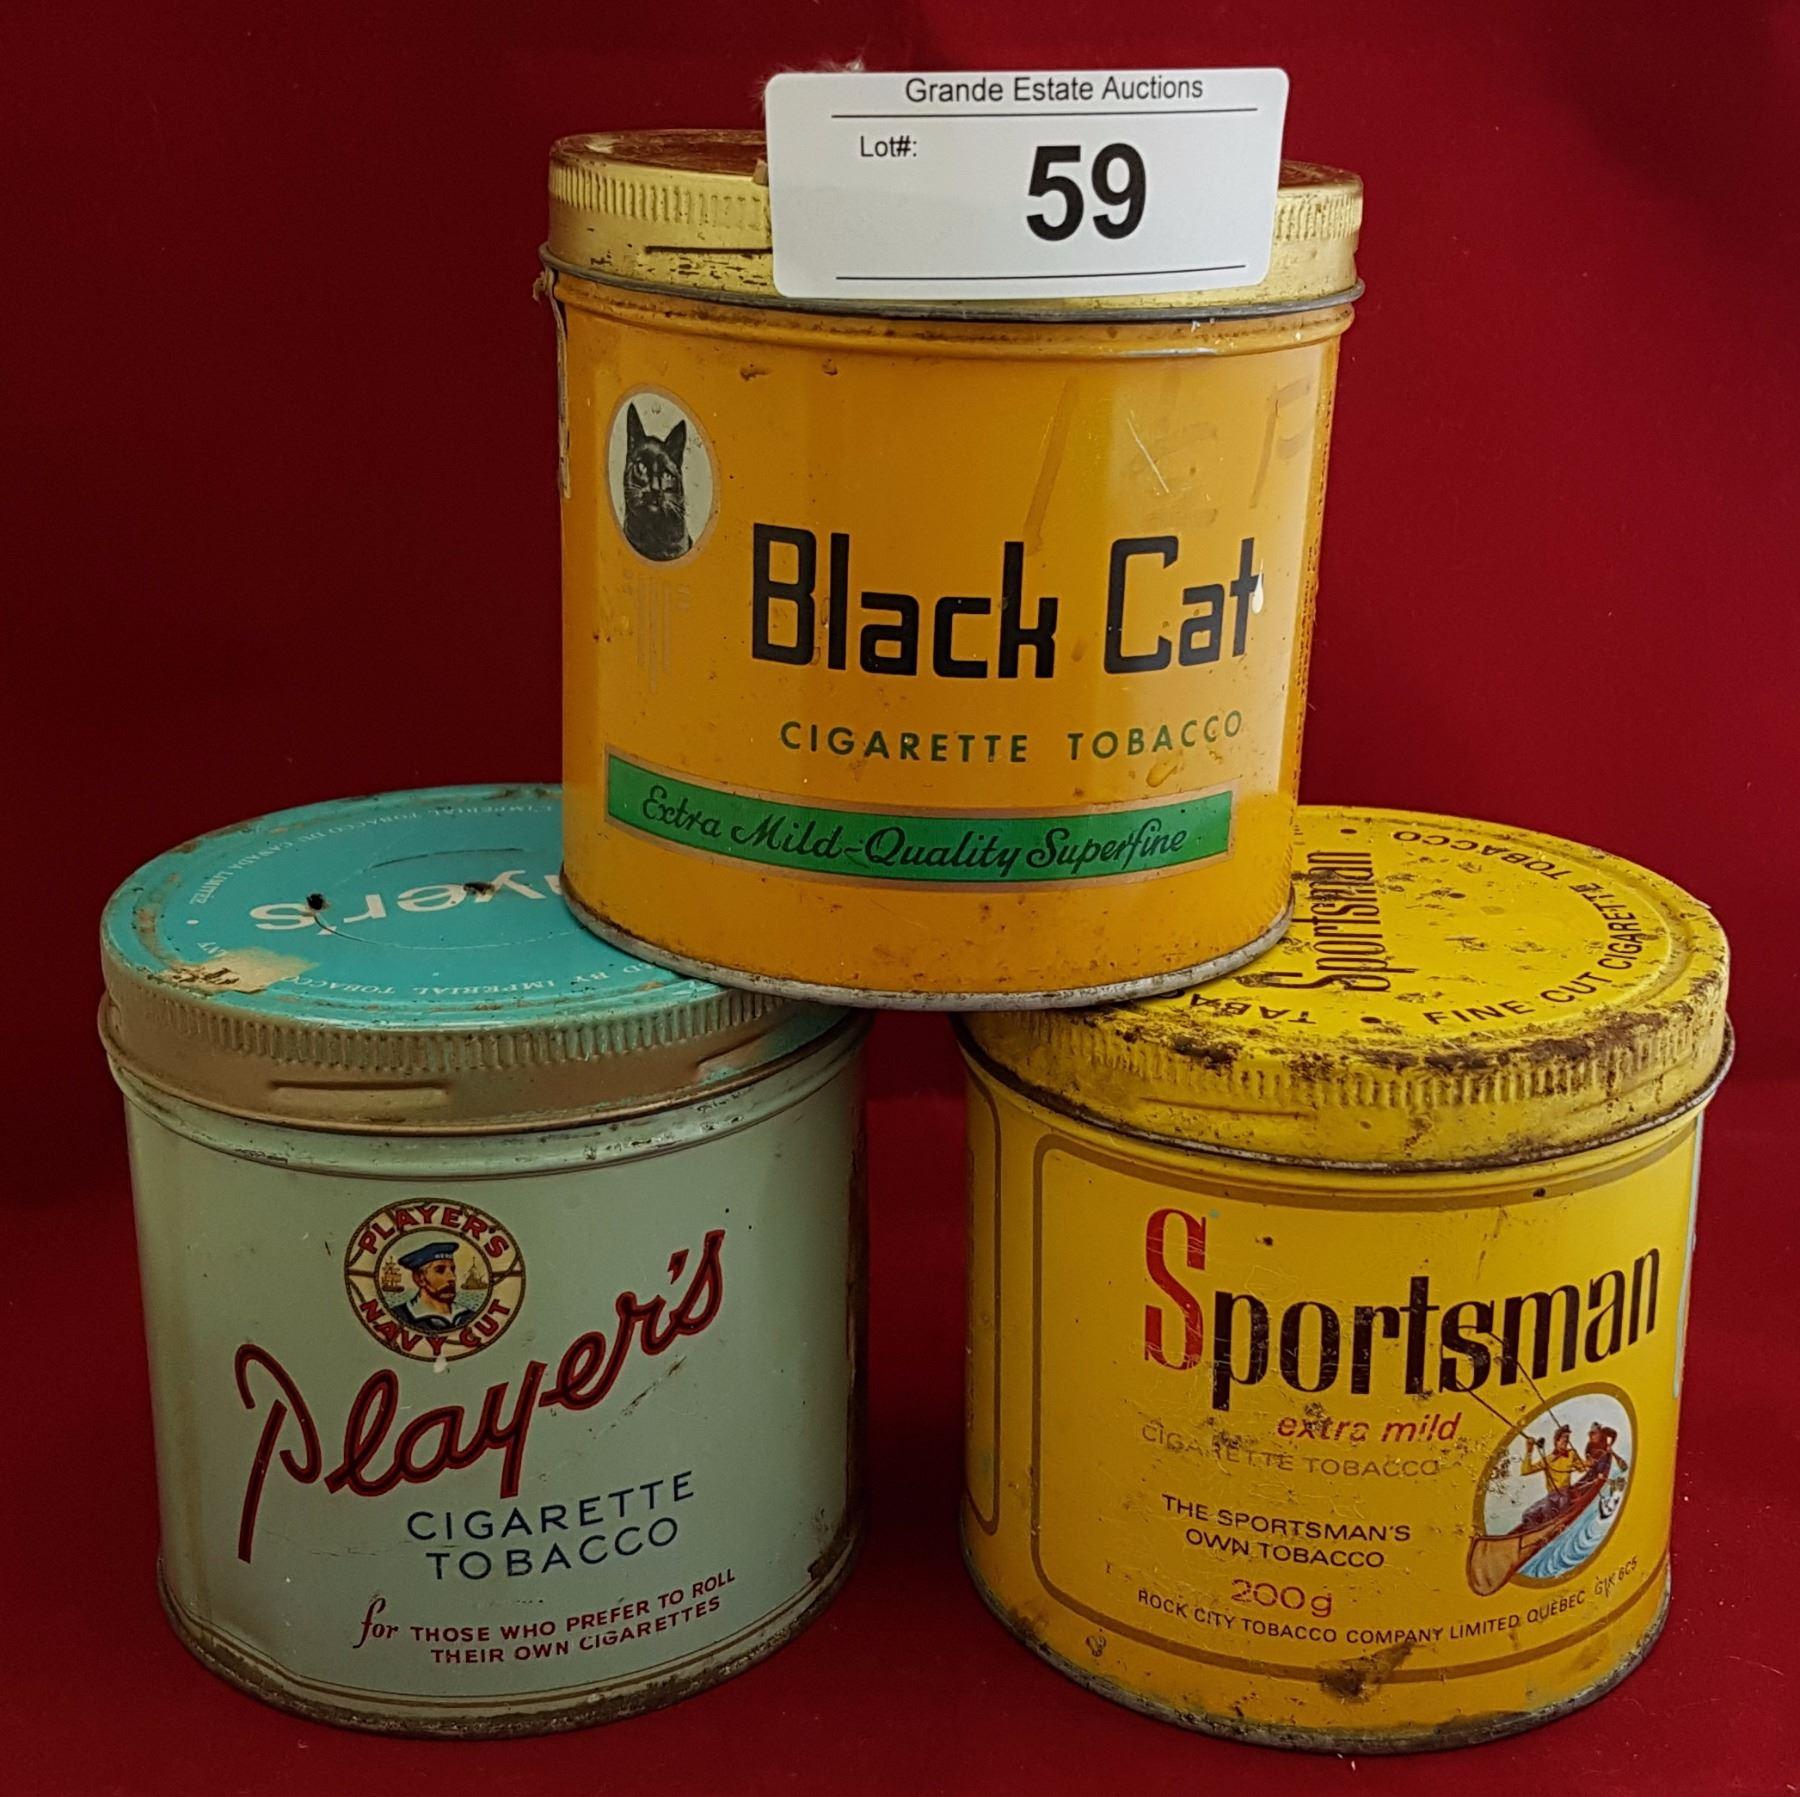 Think, vintage cigarette tins are